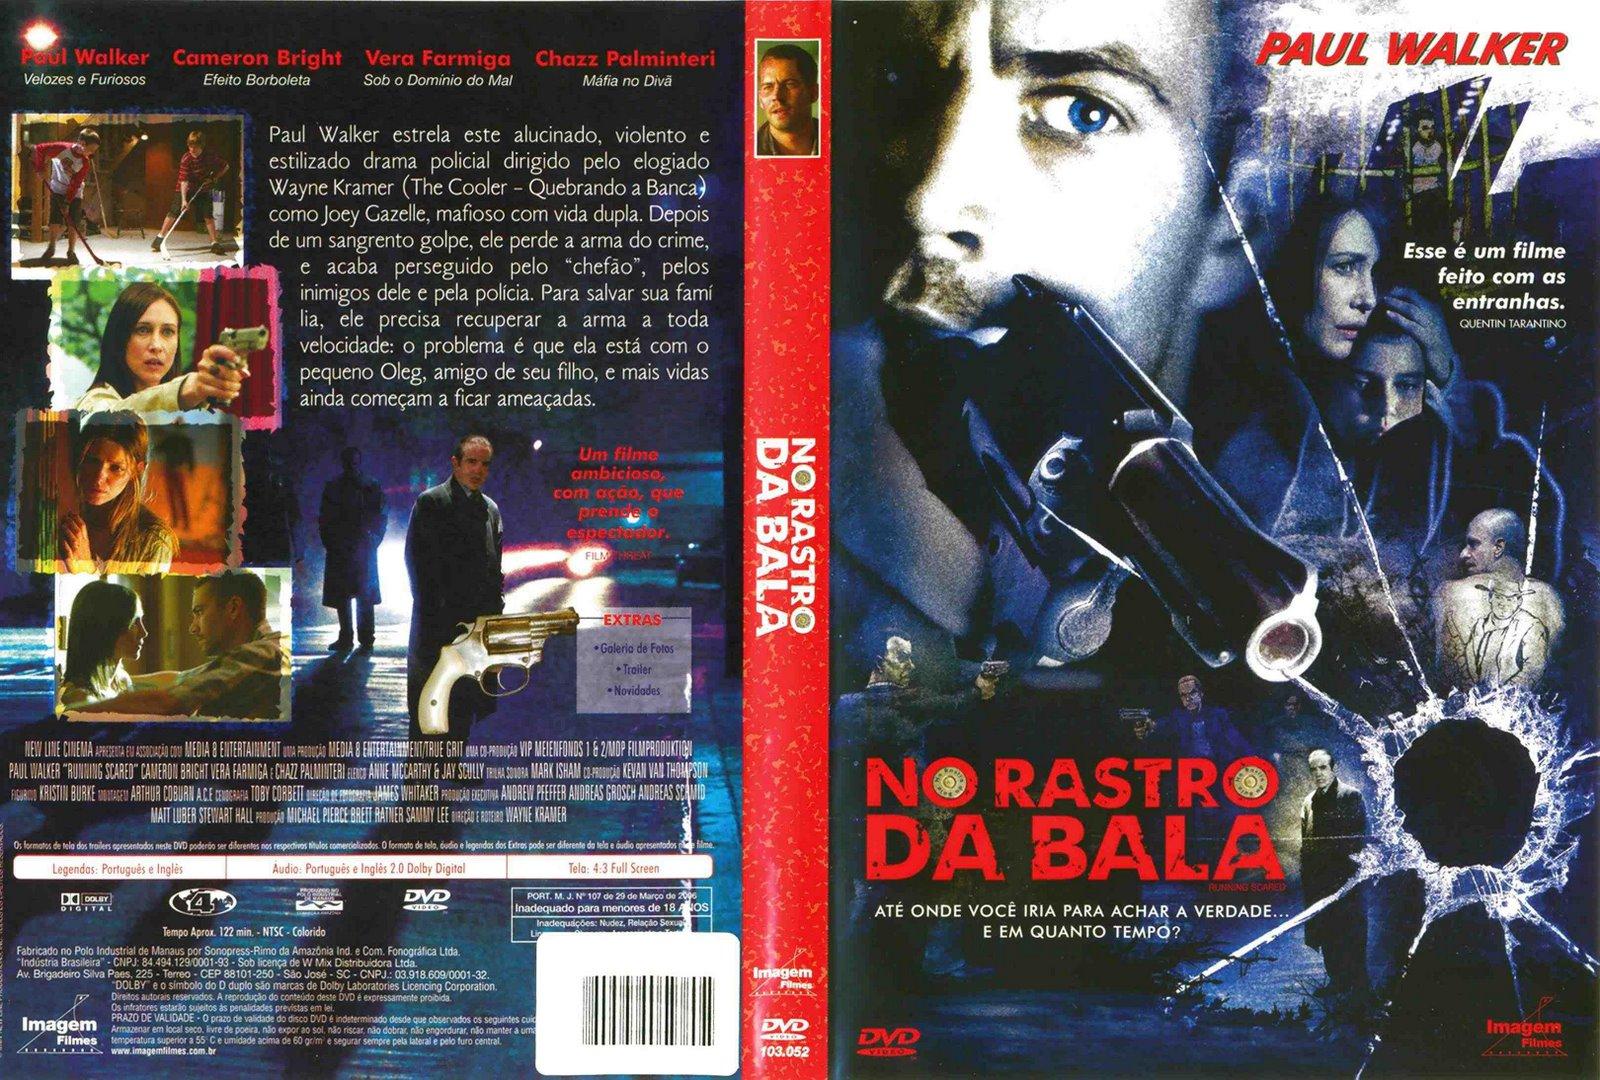 http://3.bp.blogspot.com/_Tgeb_LTYc0o/S8E7ymPBvKI/AAAAAAAAAPc/HlRk1qQW8Jc/s1600/No_Rastro_Da_Bala.jpg